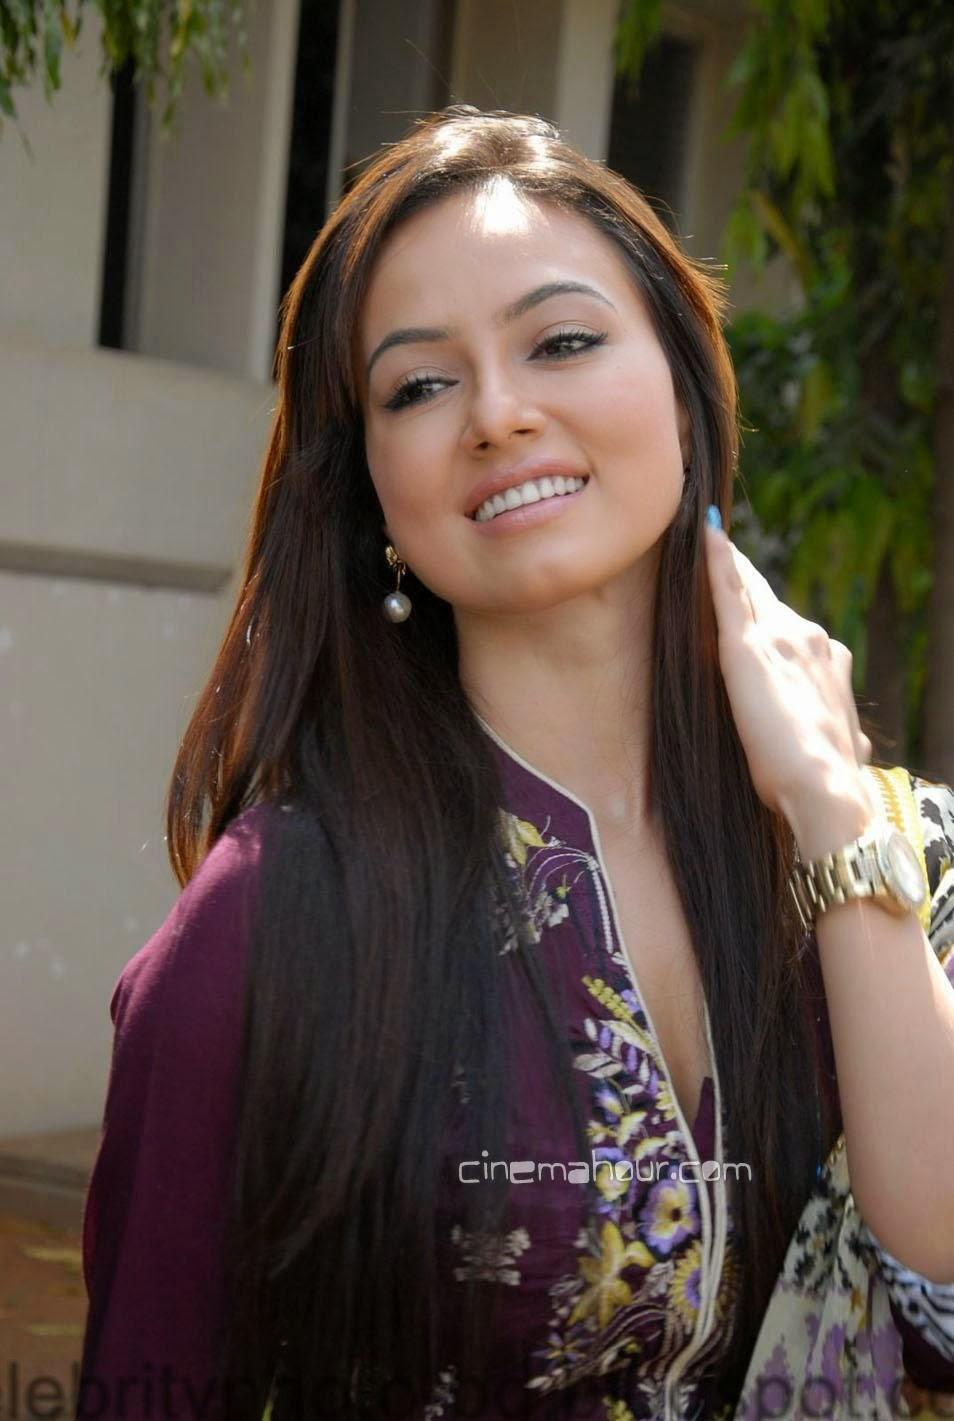 South Indian Beautiful Model Sana Khan Latest Hot Photos With Biography